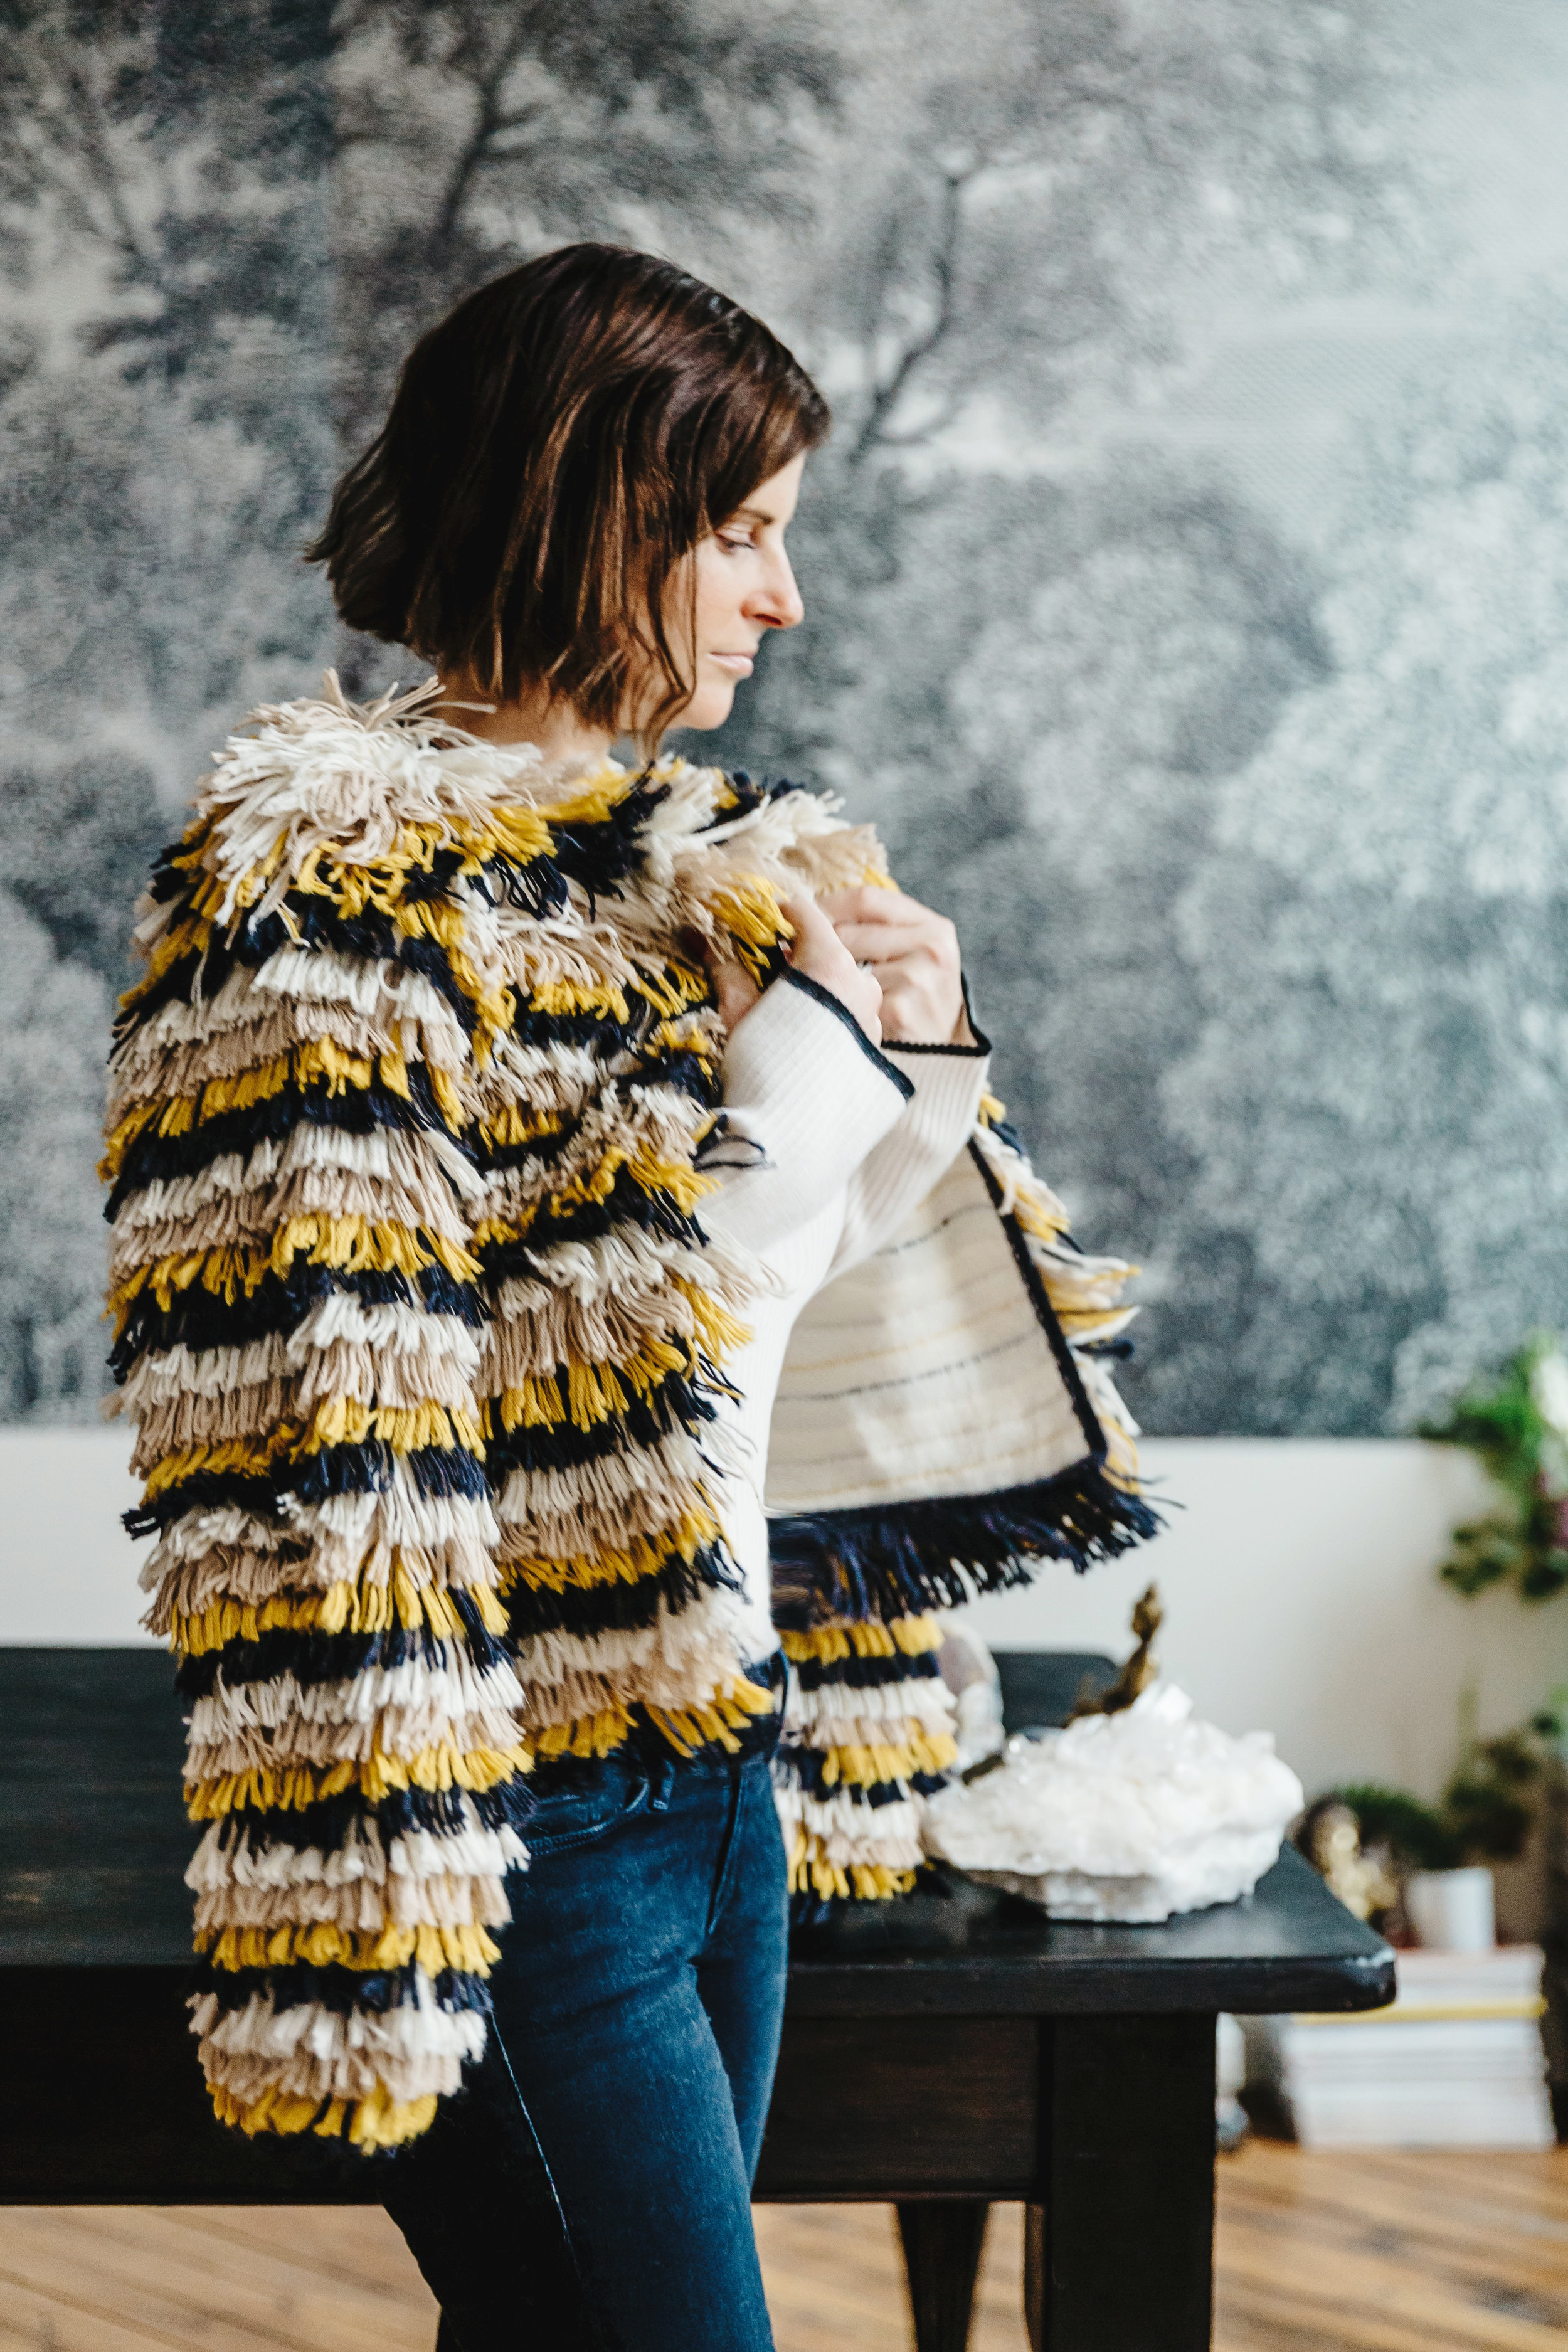 Courtney wears  Jenna jacket  (made by Bolivian artisans) +  Aura crew neck  in Ivory